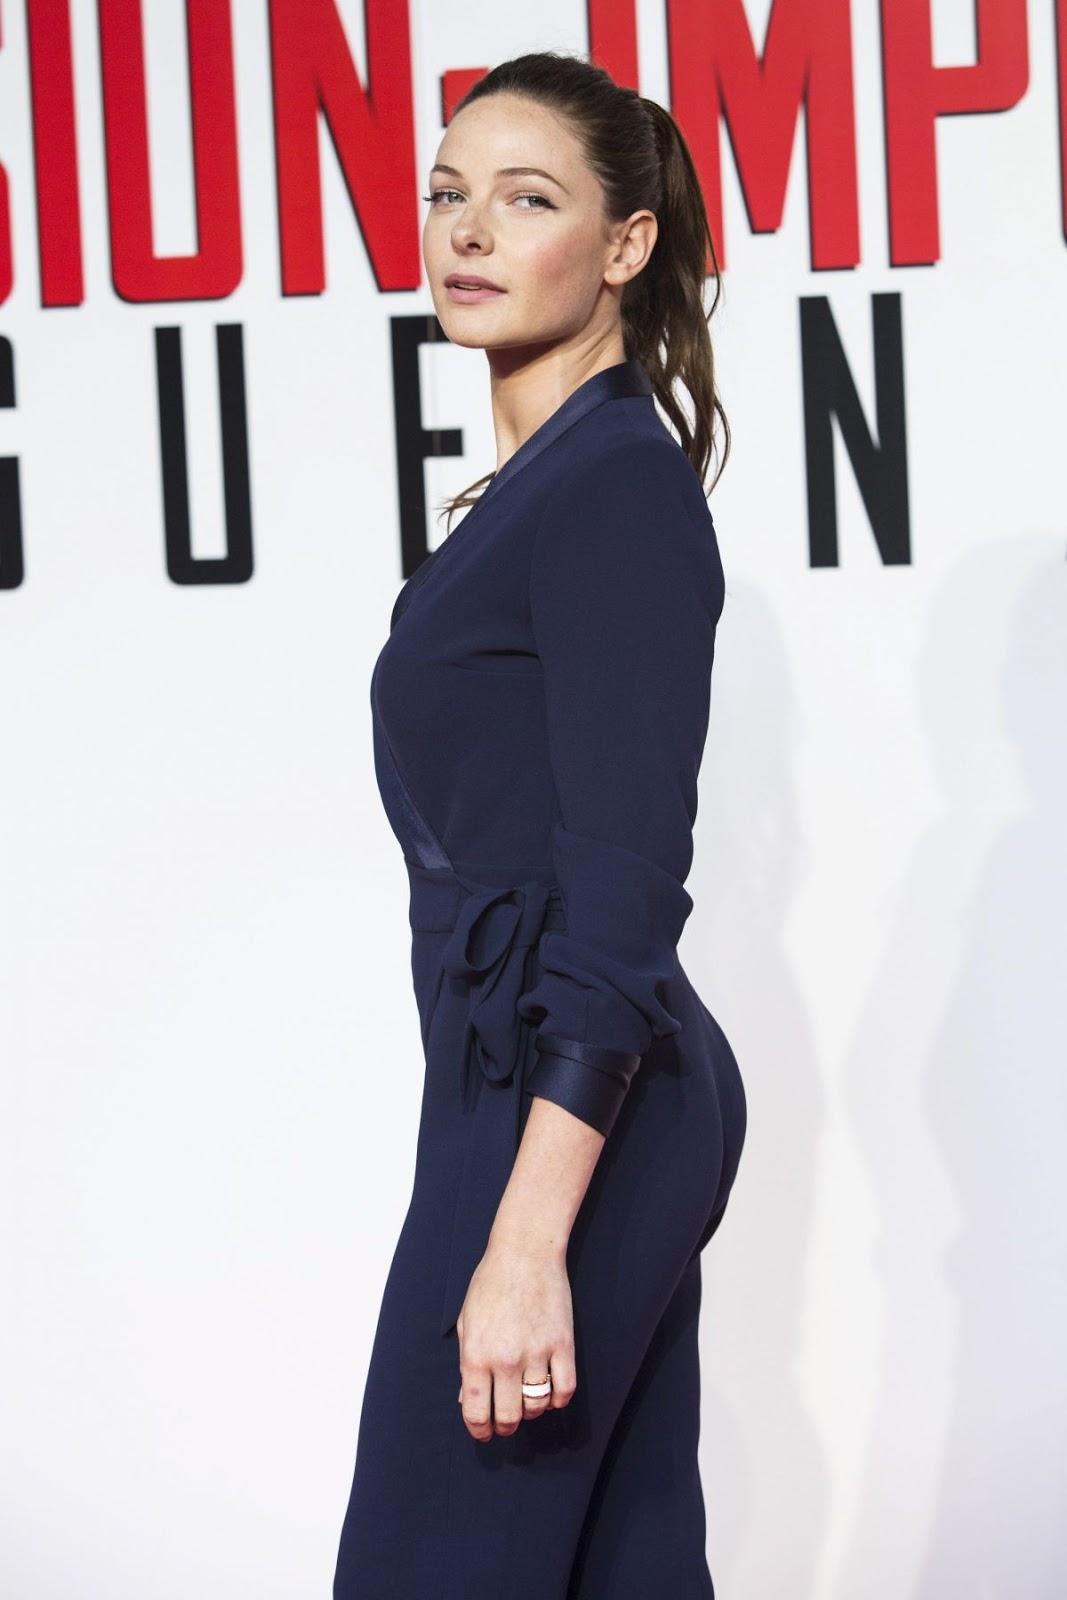 MI 5 Rogue Nation actress Rebecca Ferguson HD Photos & Wallpapers